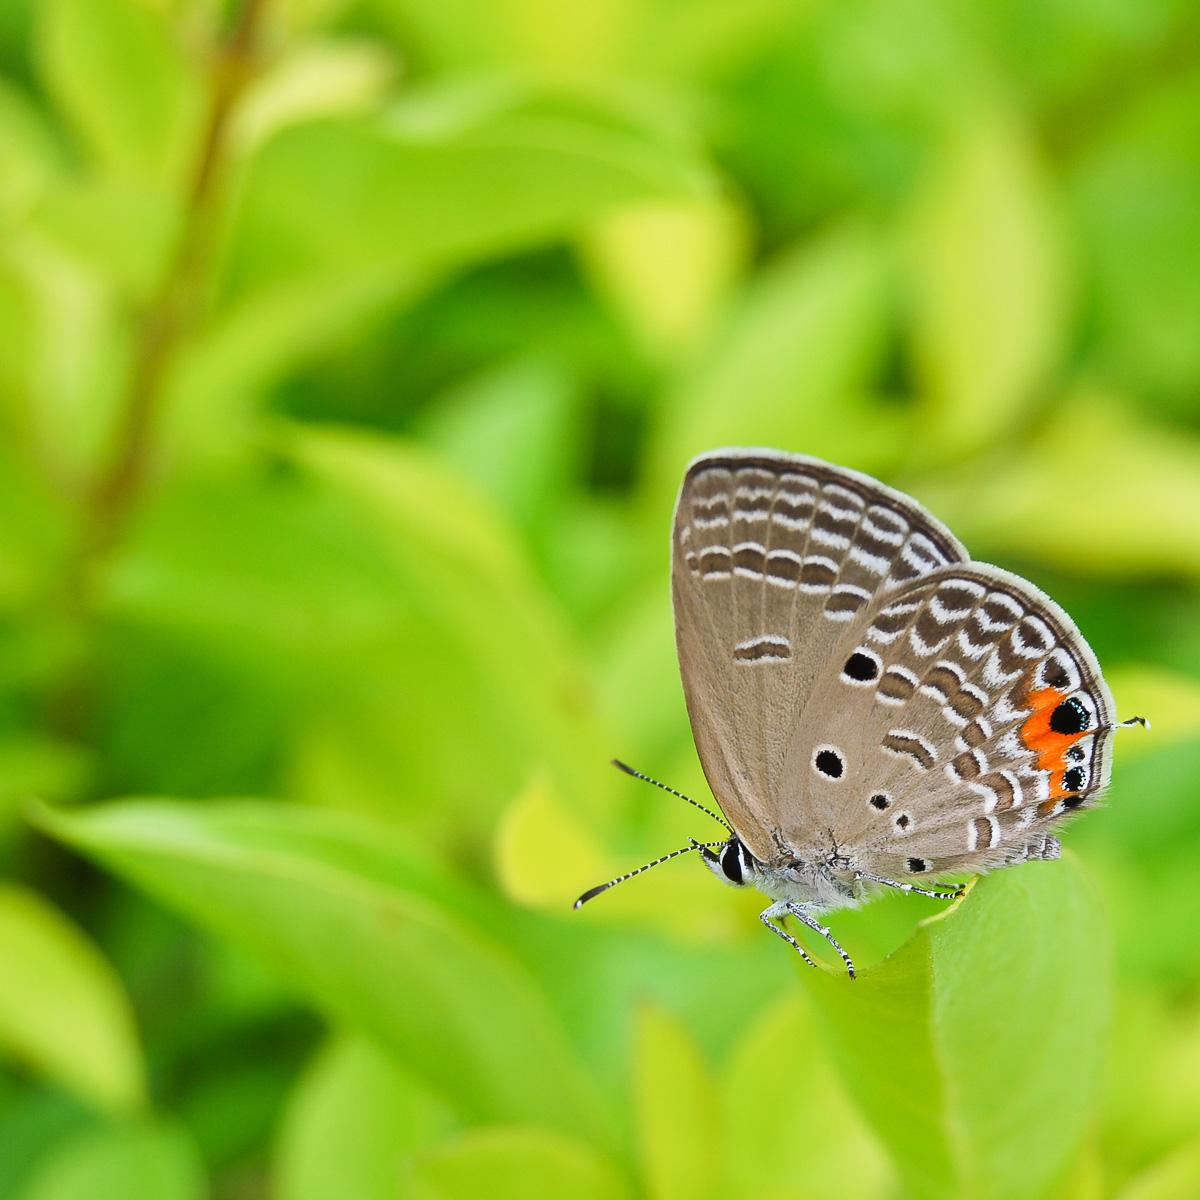 Fotonomaden Bildanalyse Schmetterling Endversion